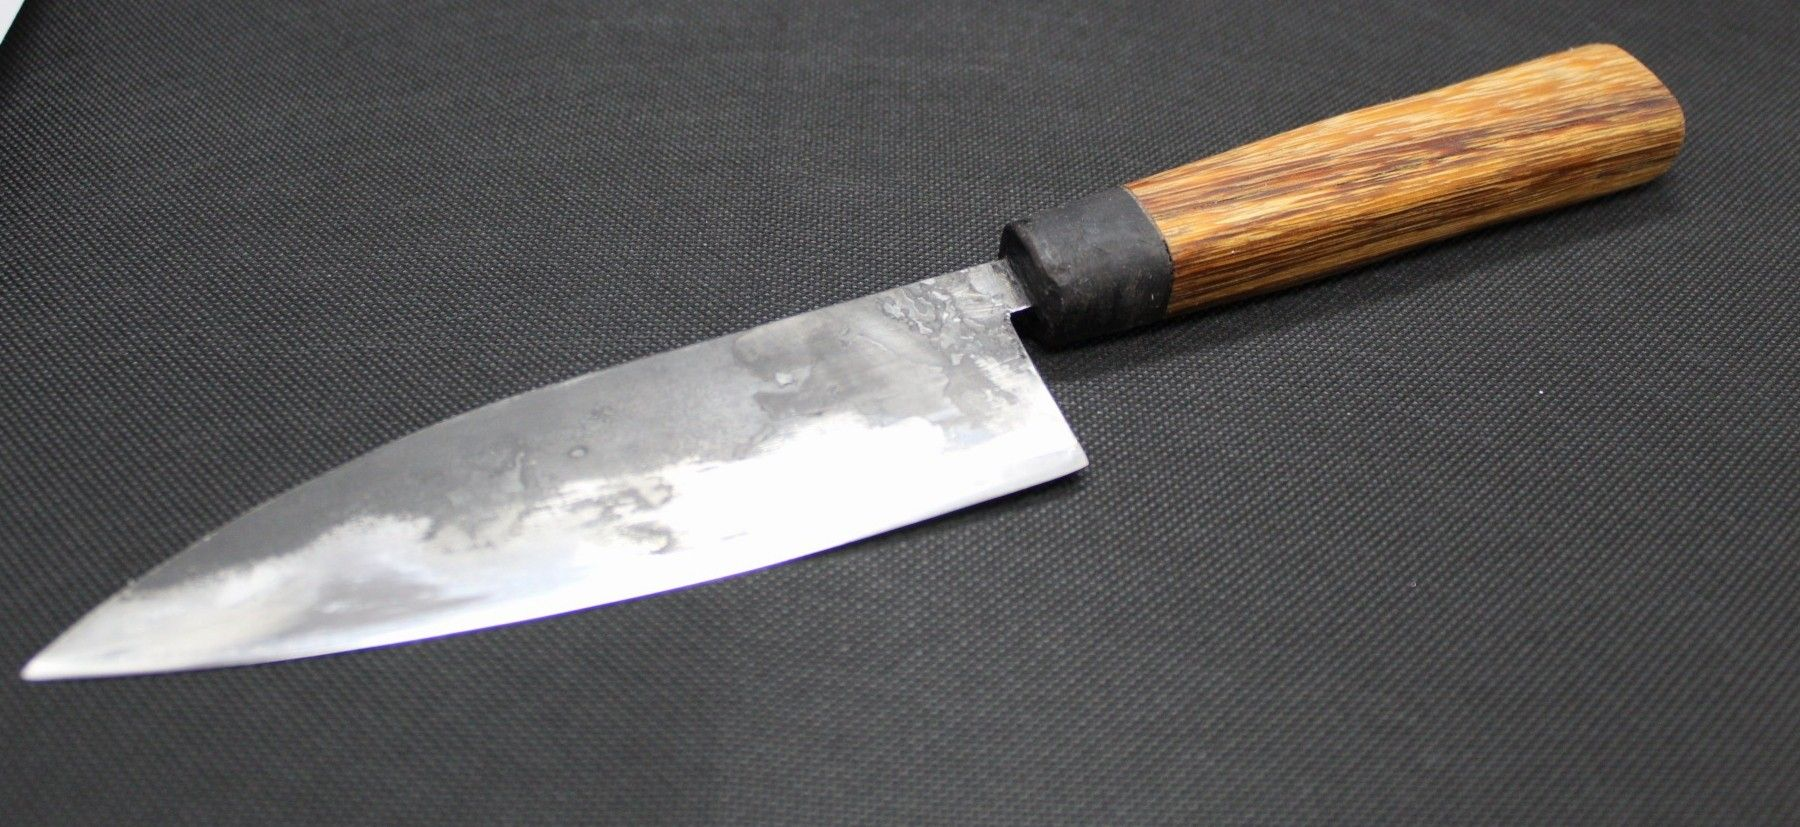 Japanese Kitchen Knife In 2020 Kitchen Knives High Carbon Steel Japanese Kitchen Knives